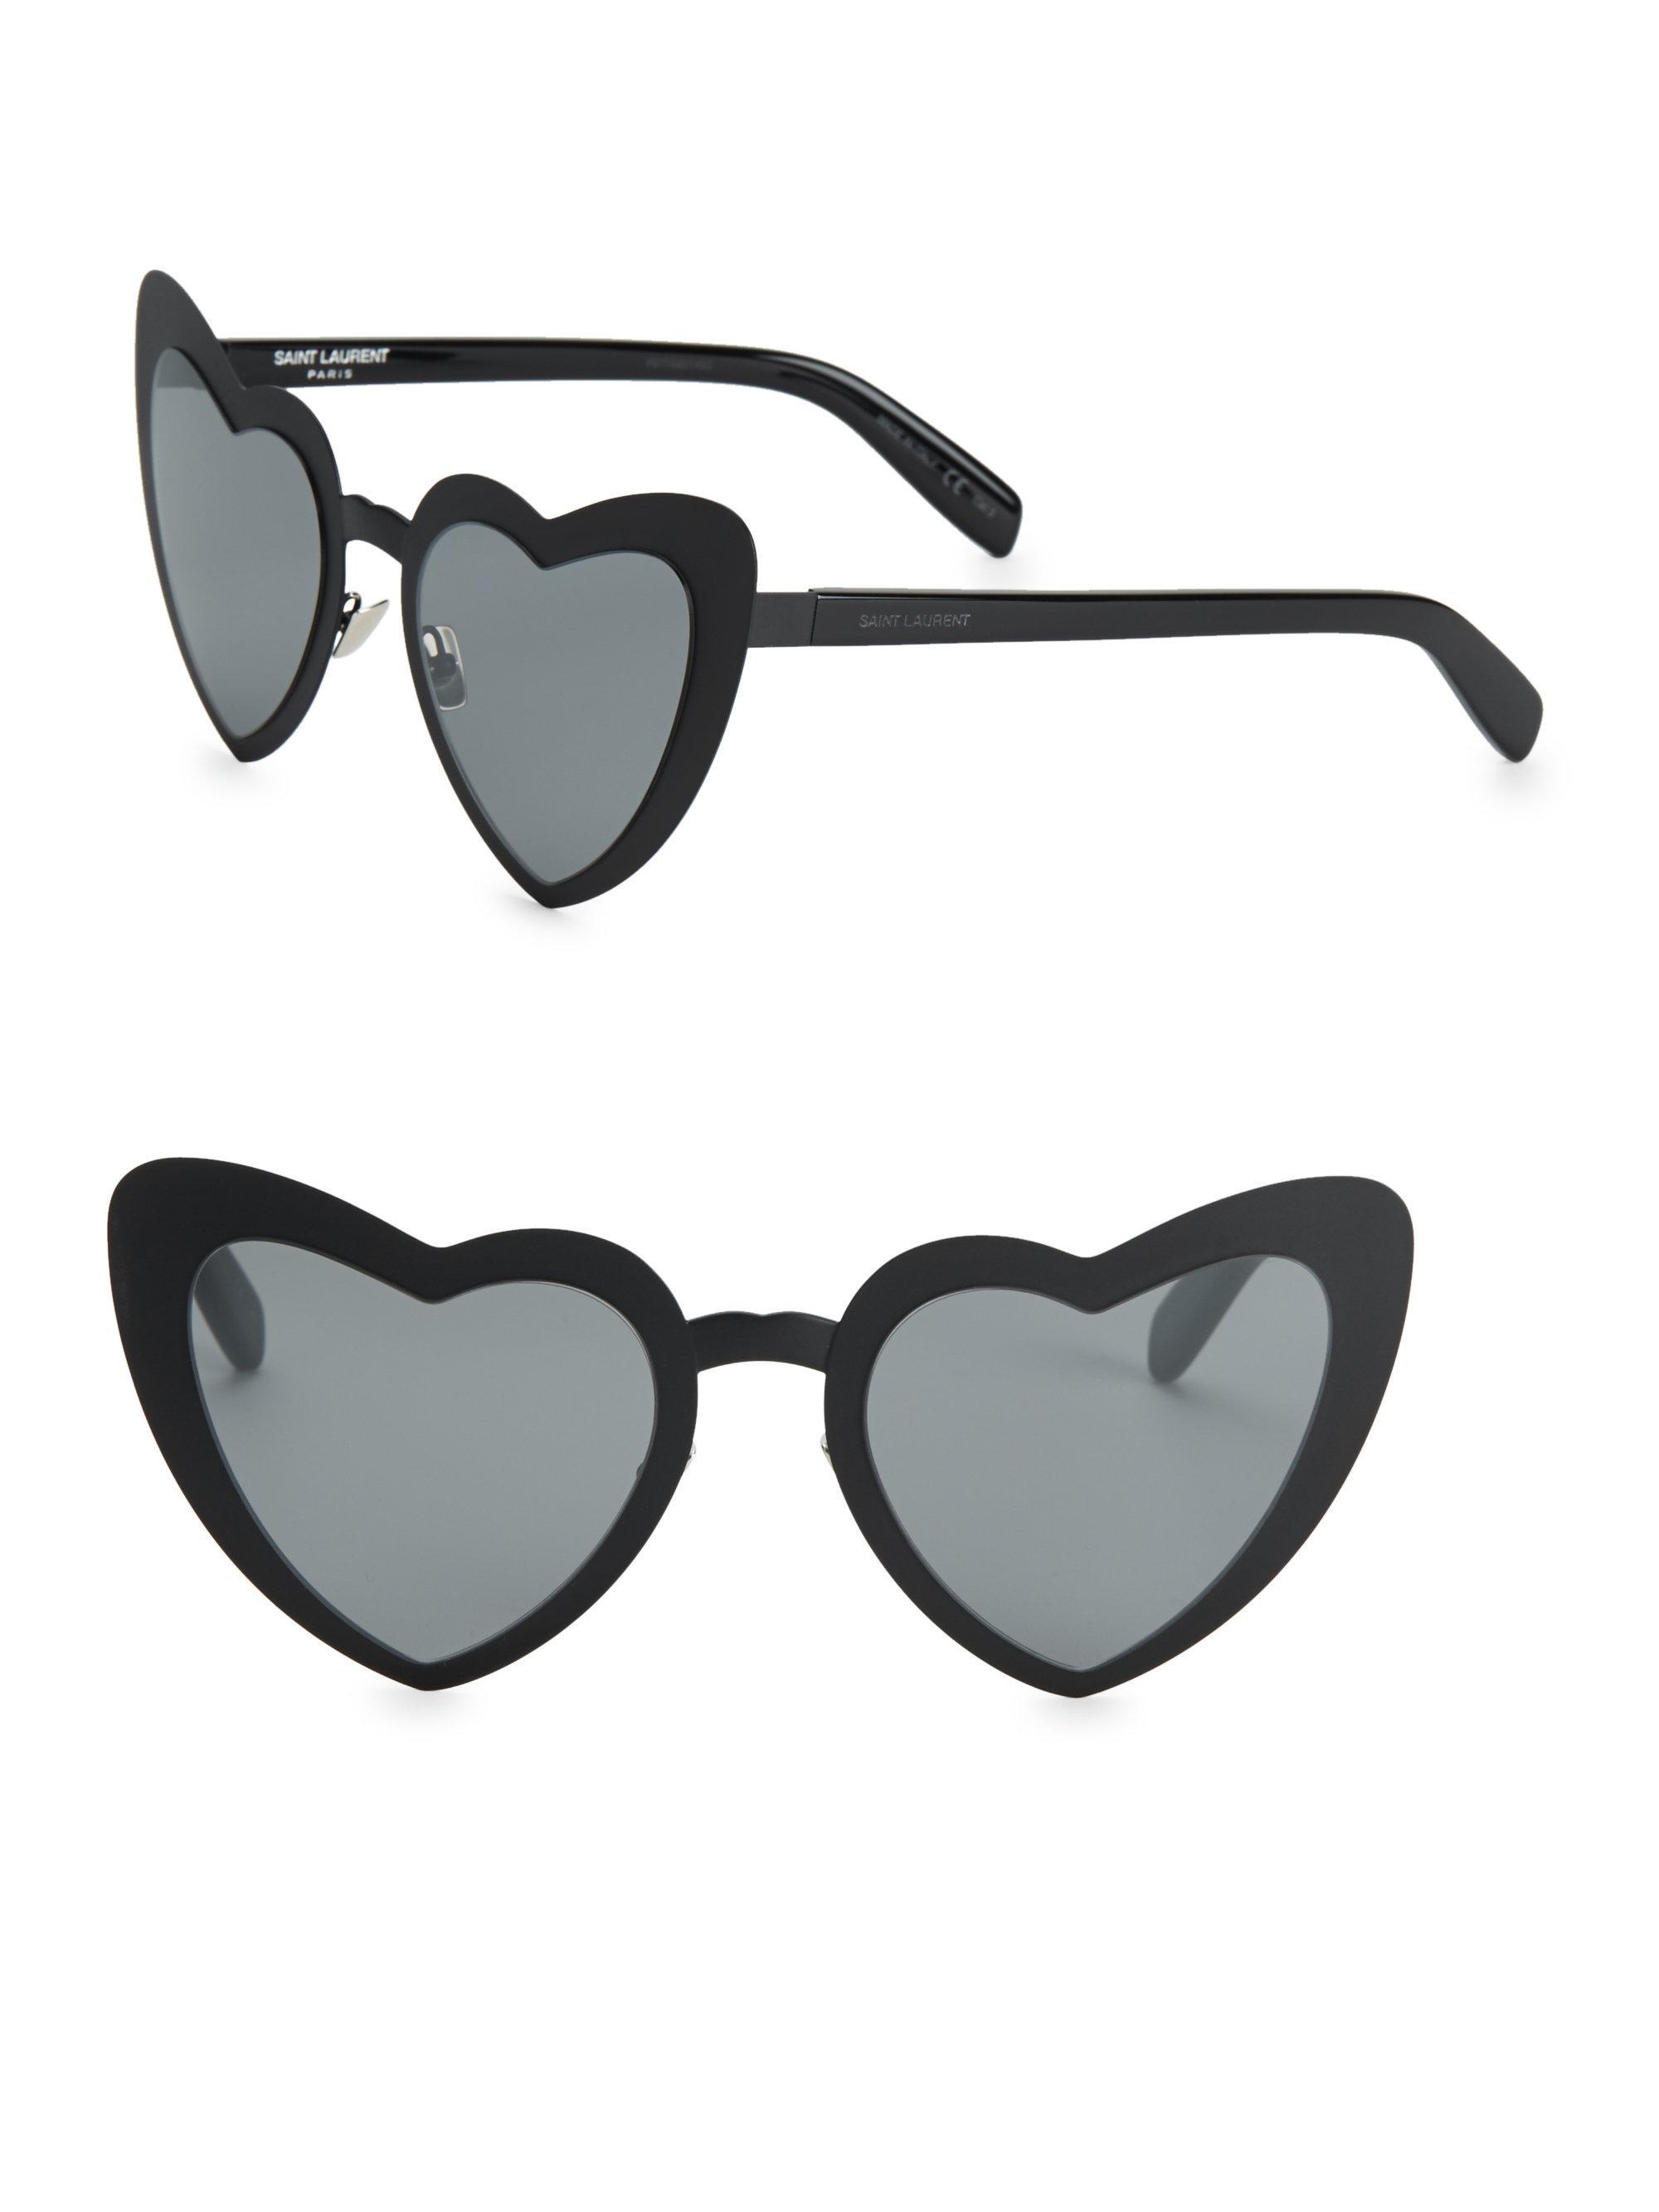 7fe3d129b080c Lyst - Saint Laurent Sl 196 53mm Lou Lou Heart-shaped Sunglasses in Black